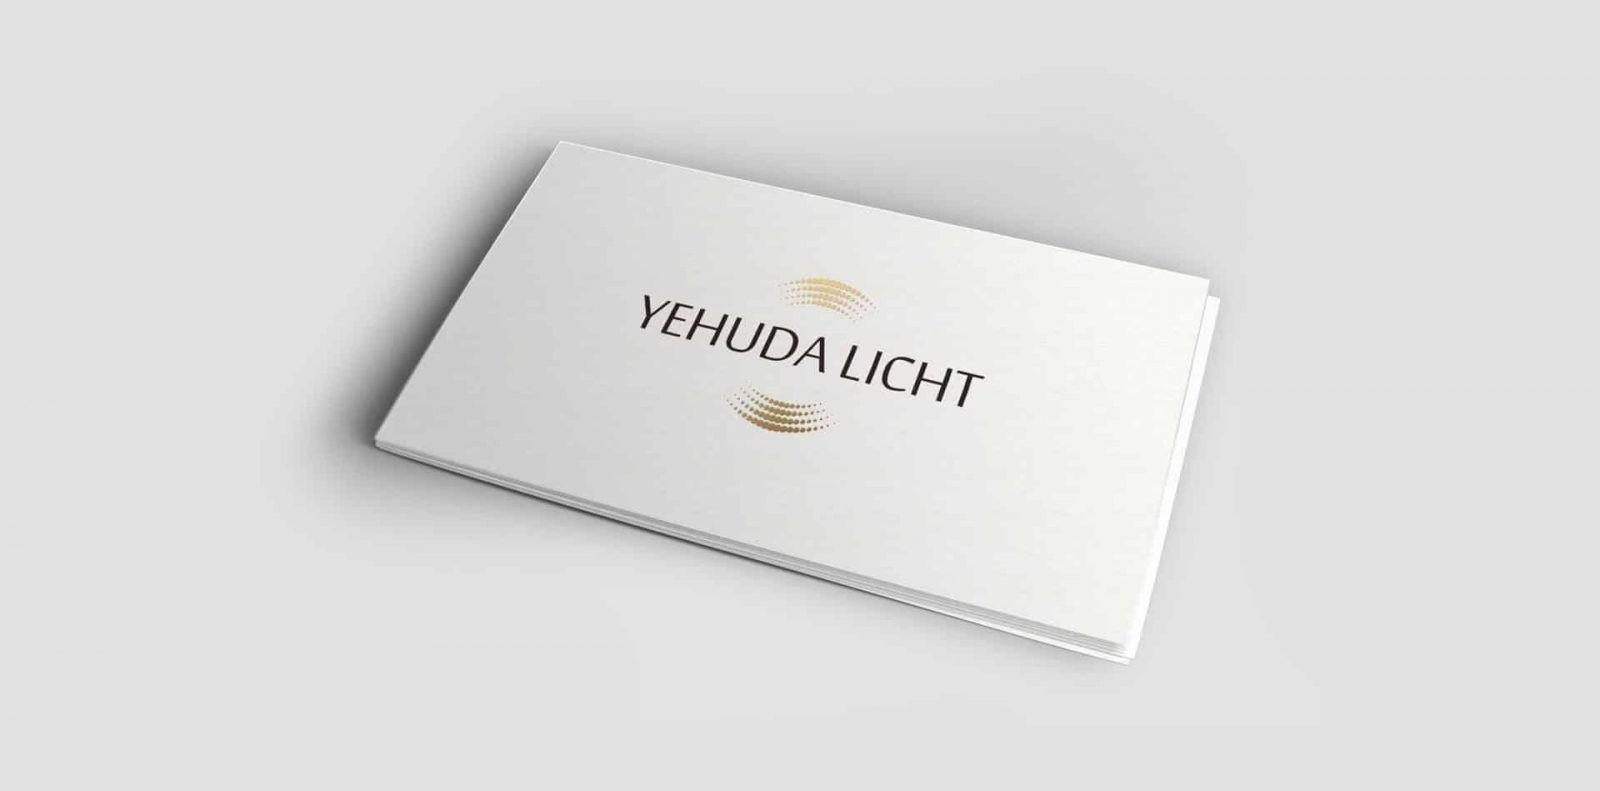 yehudalight-strip-1